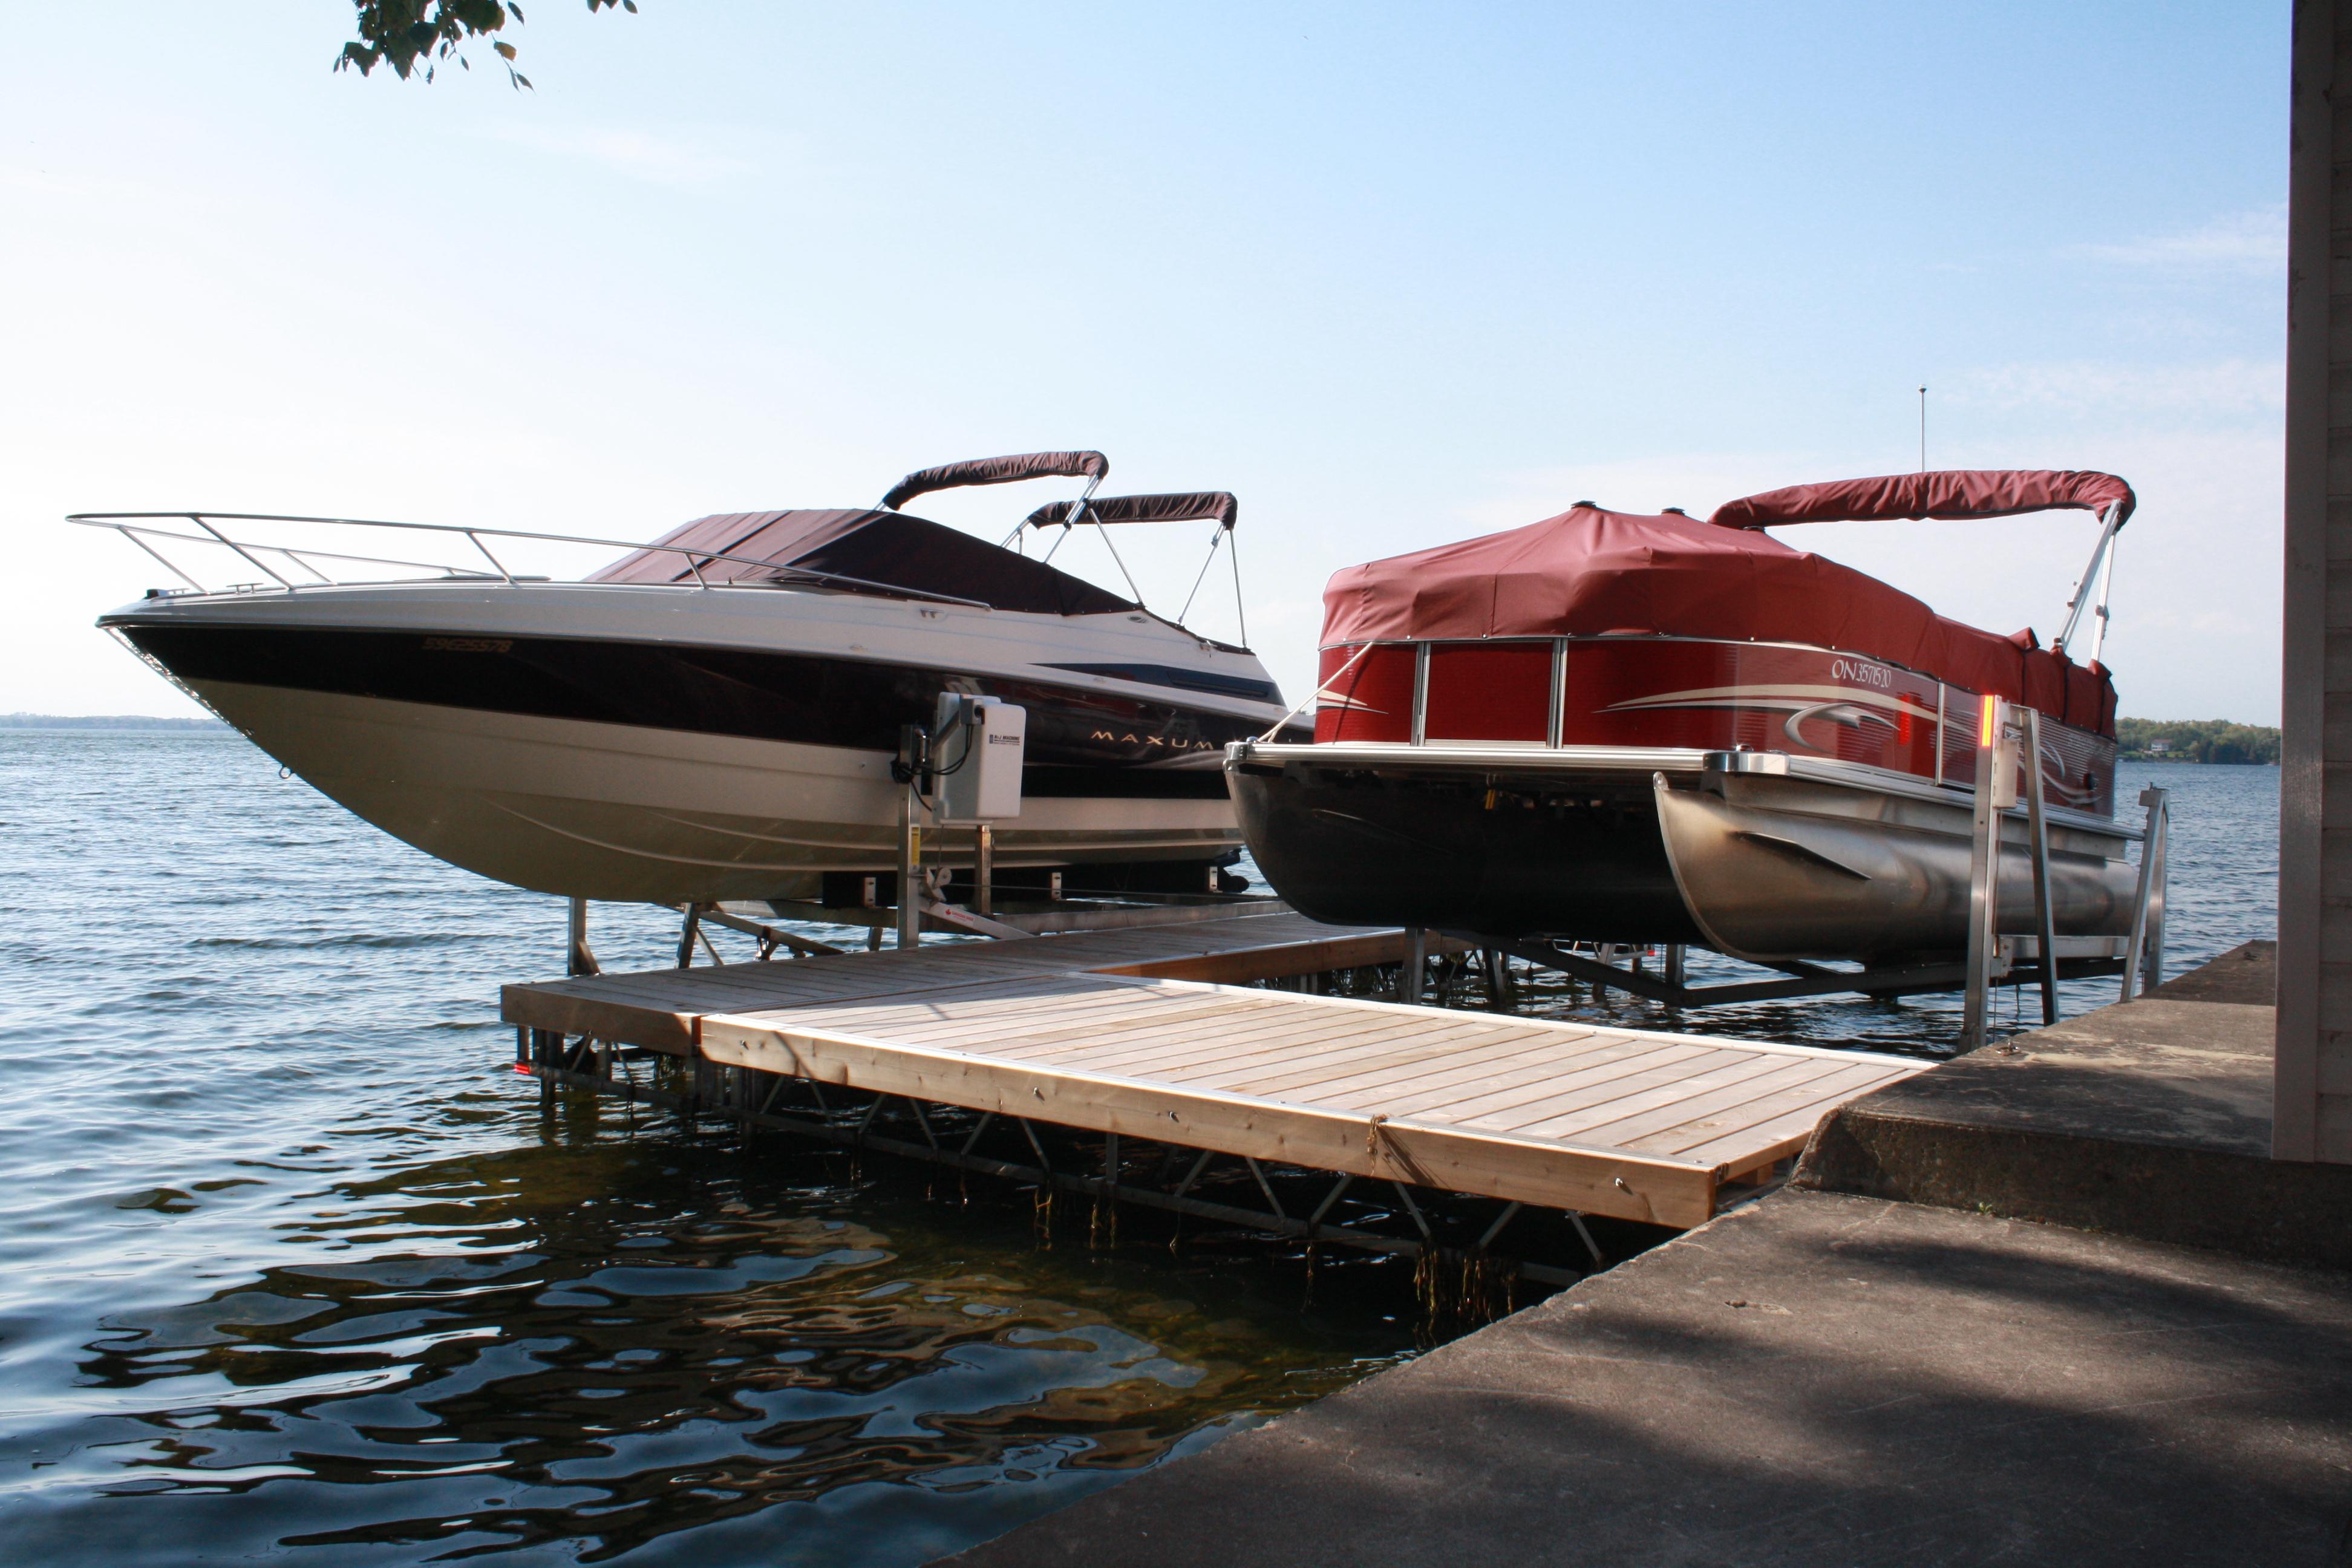 Vertical Boat Lifts Pontoon Boat Lifts R Amp J Machine